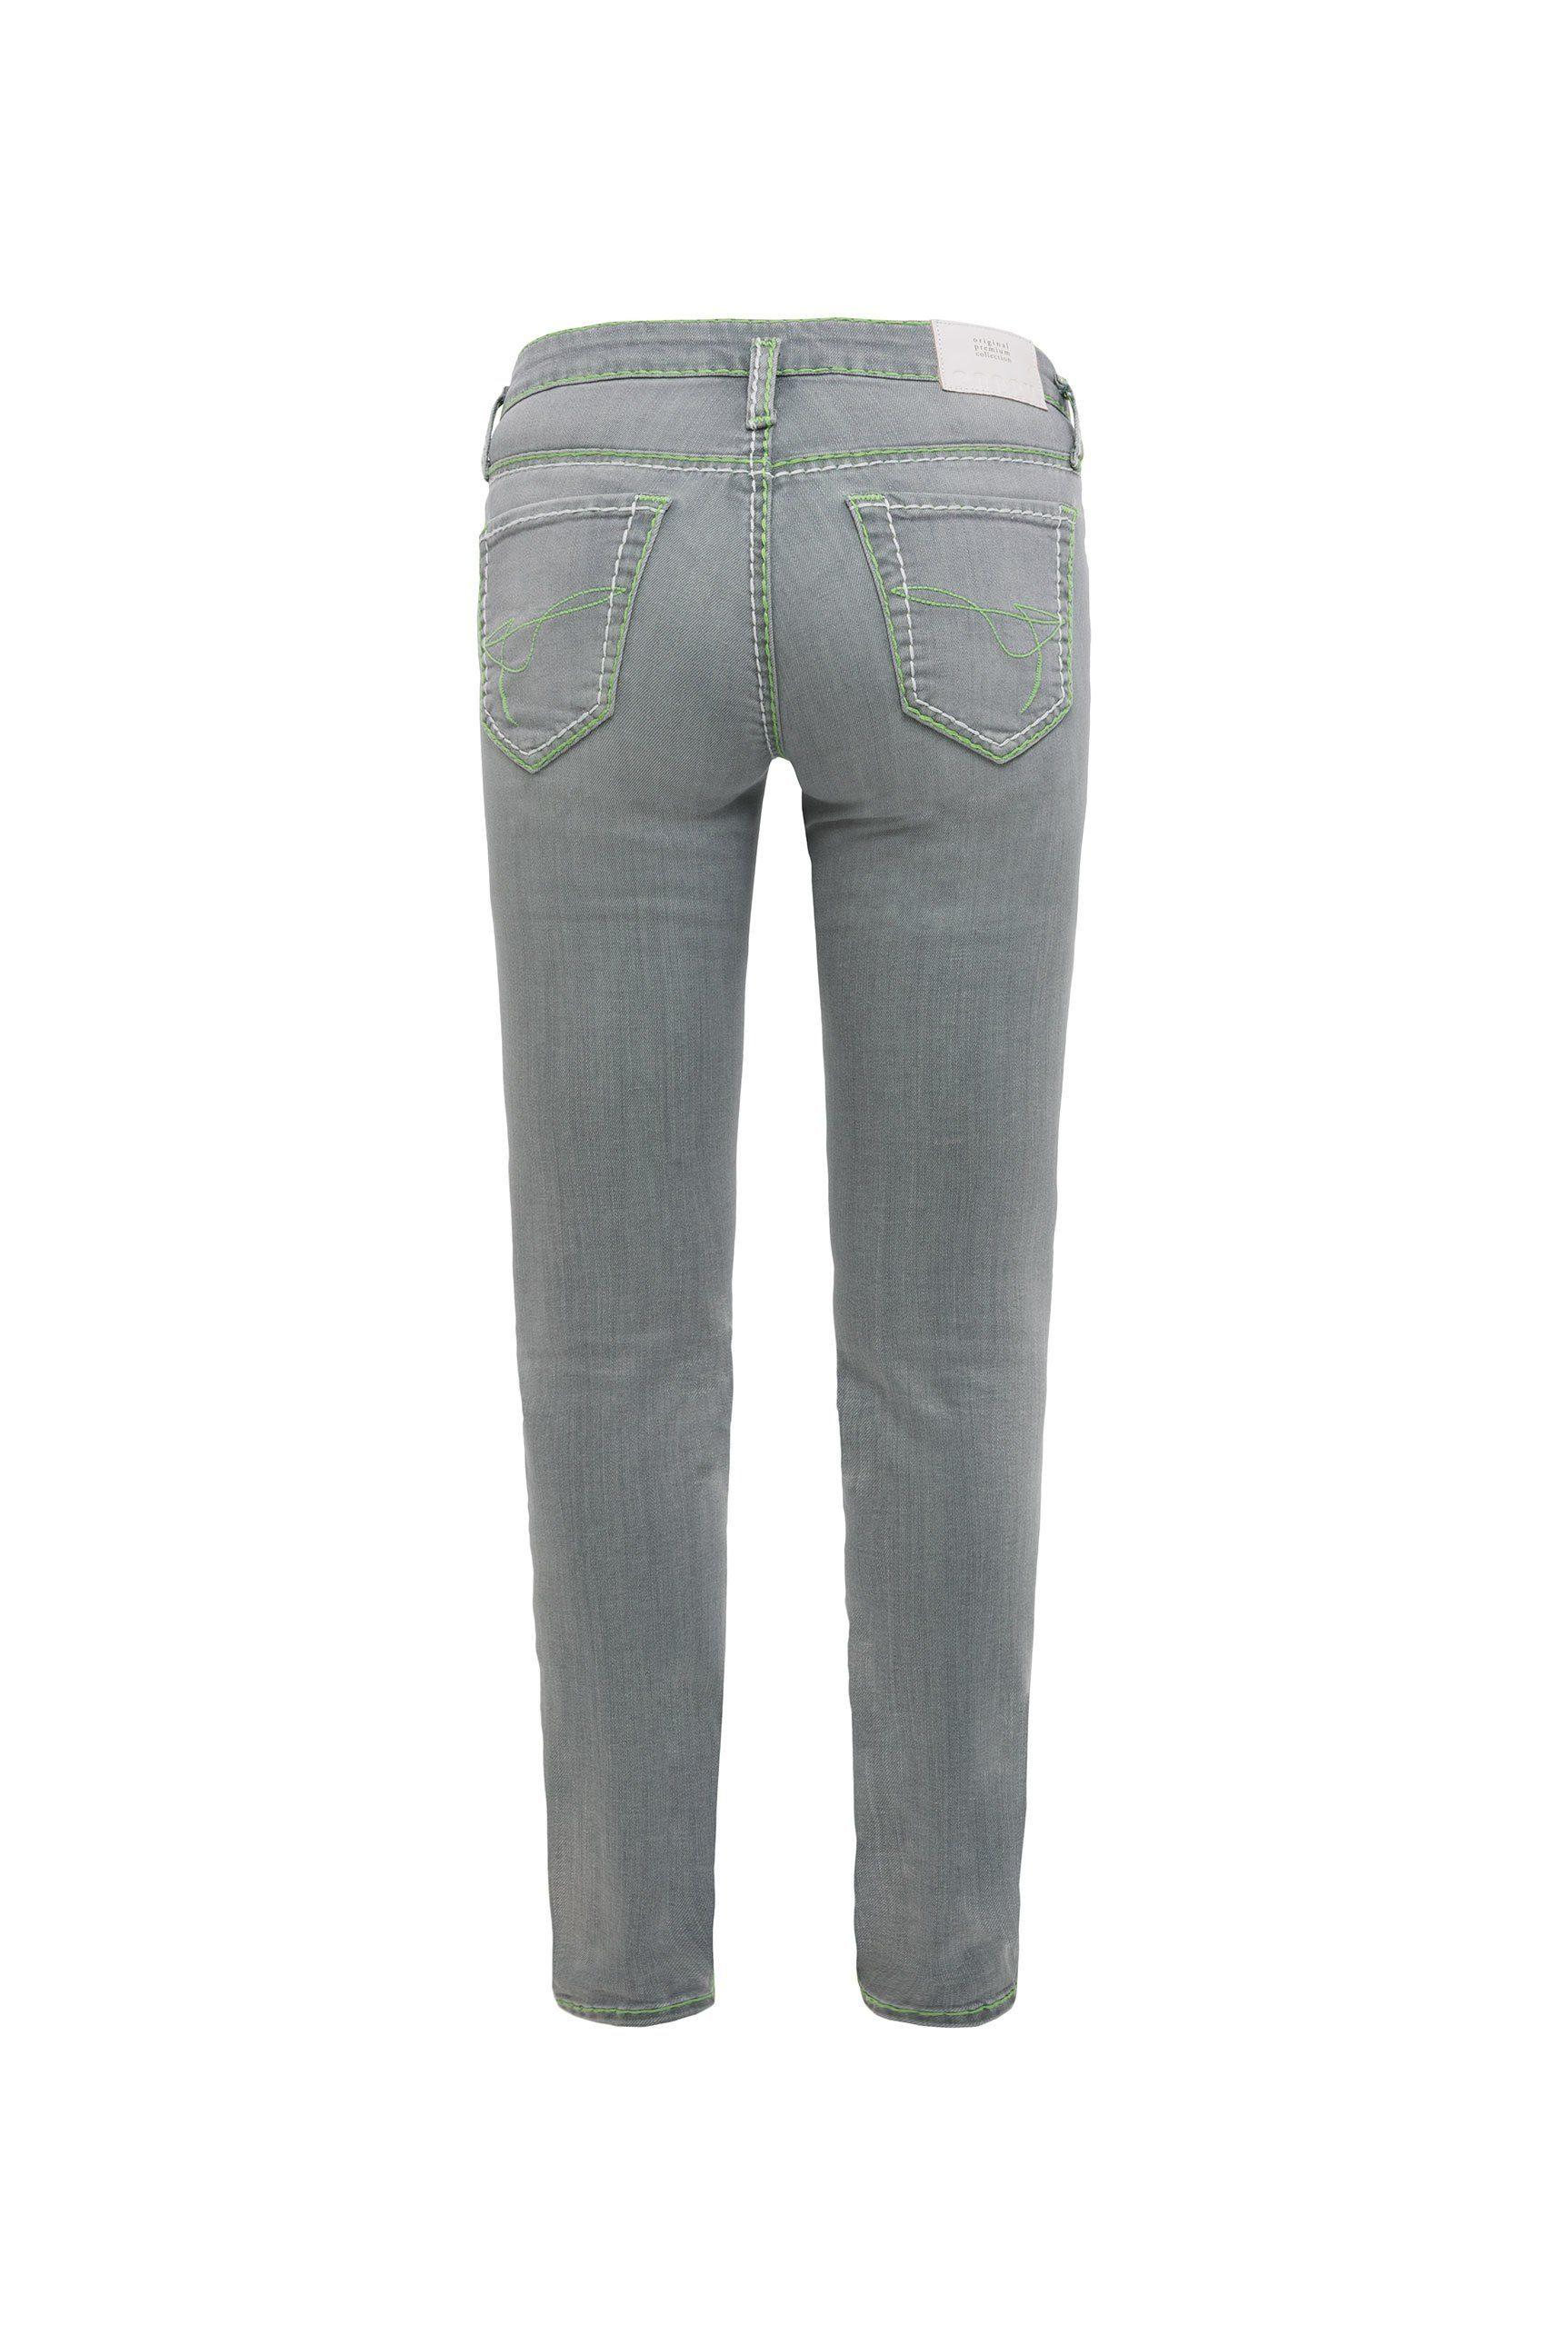 Soccx 5-pocket-jeans »ka:ra« Mit Turn-up Saum